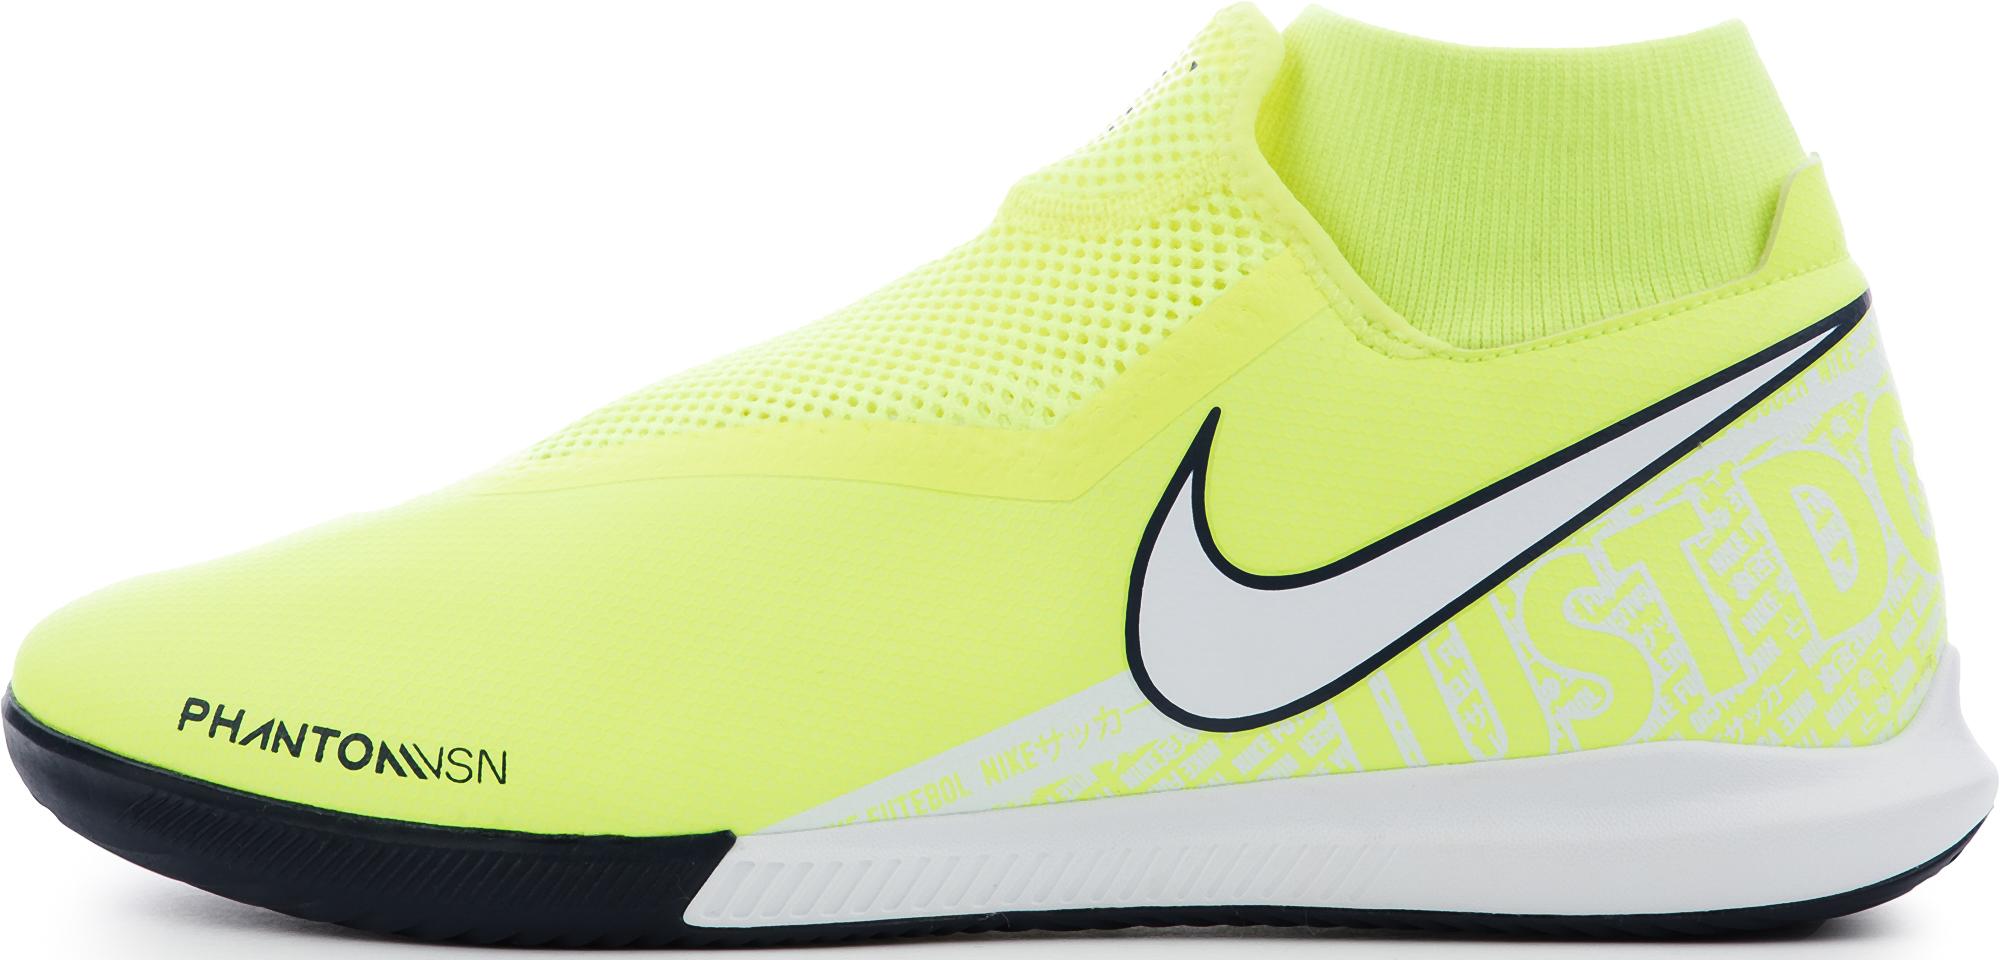 Nike Бутсы мужские Nike Phantom Vsn Academy Df Ic, размер 45 nike mercurialx proximo ii ic